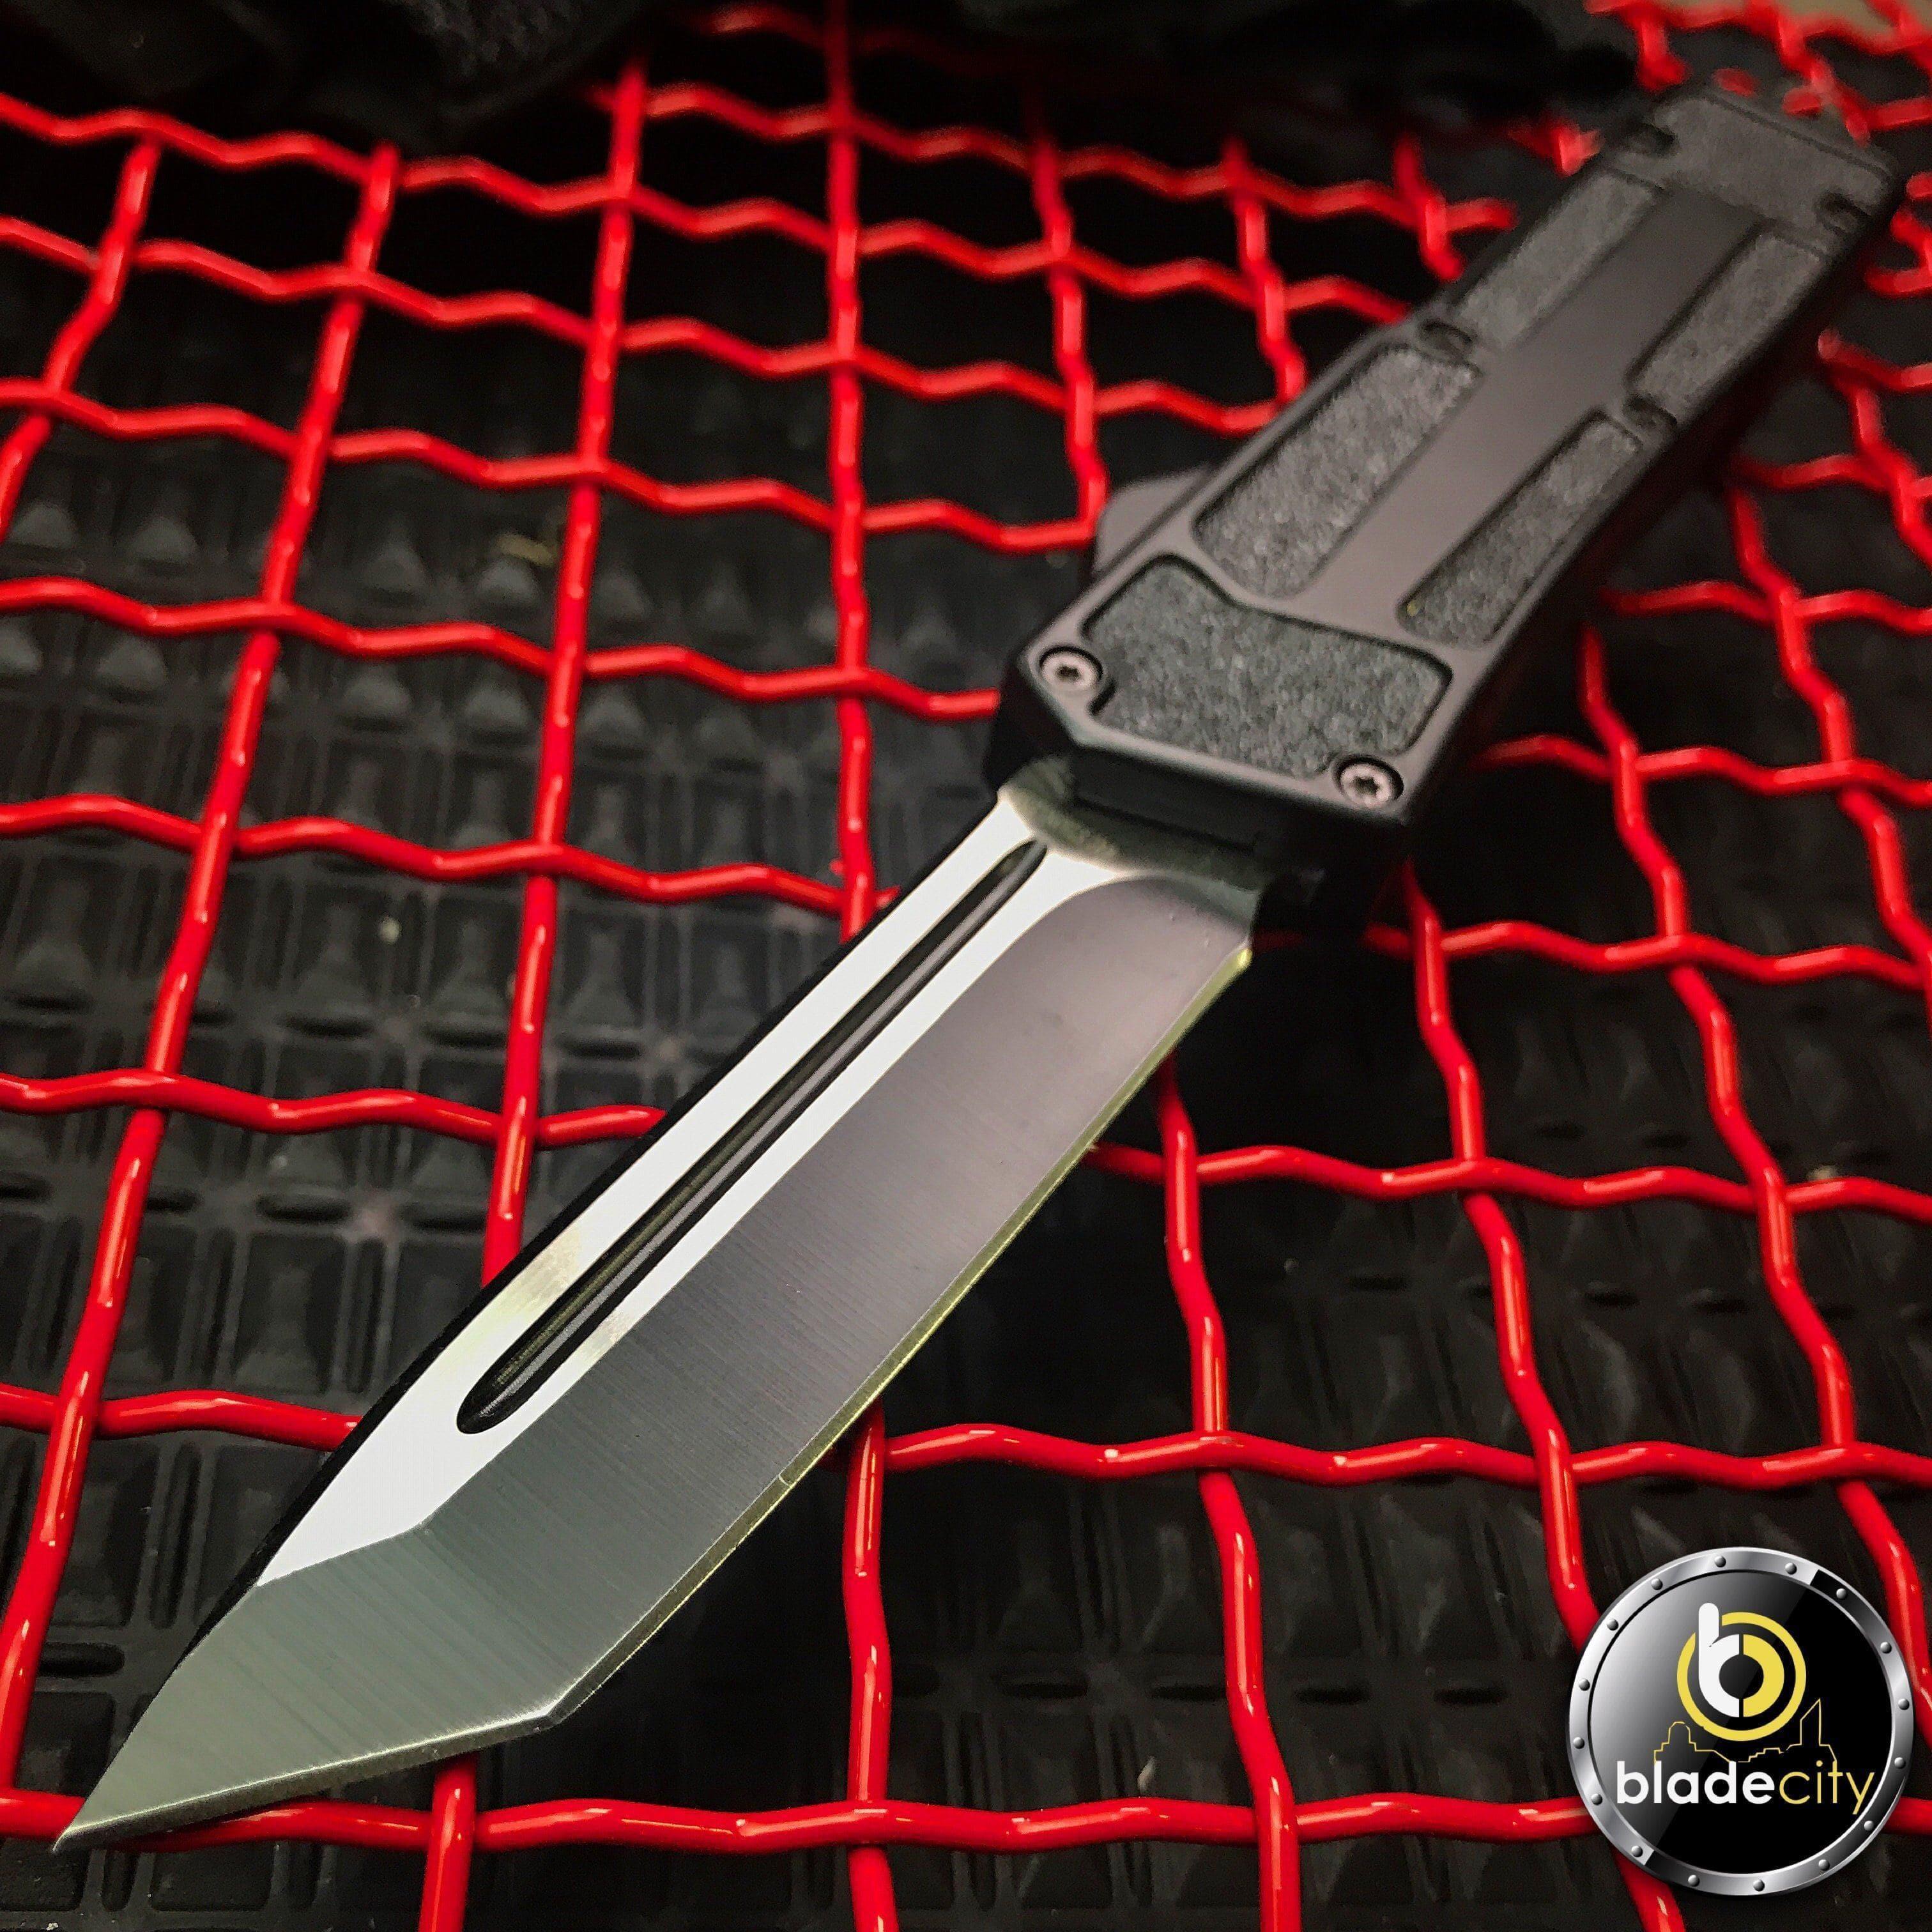 otf knife black enforcer otf lightning edition